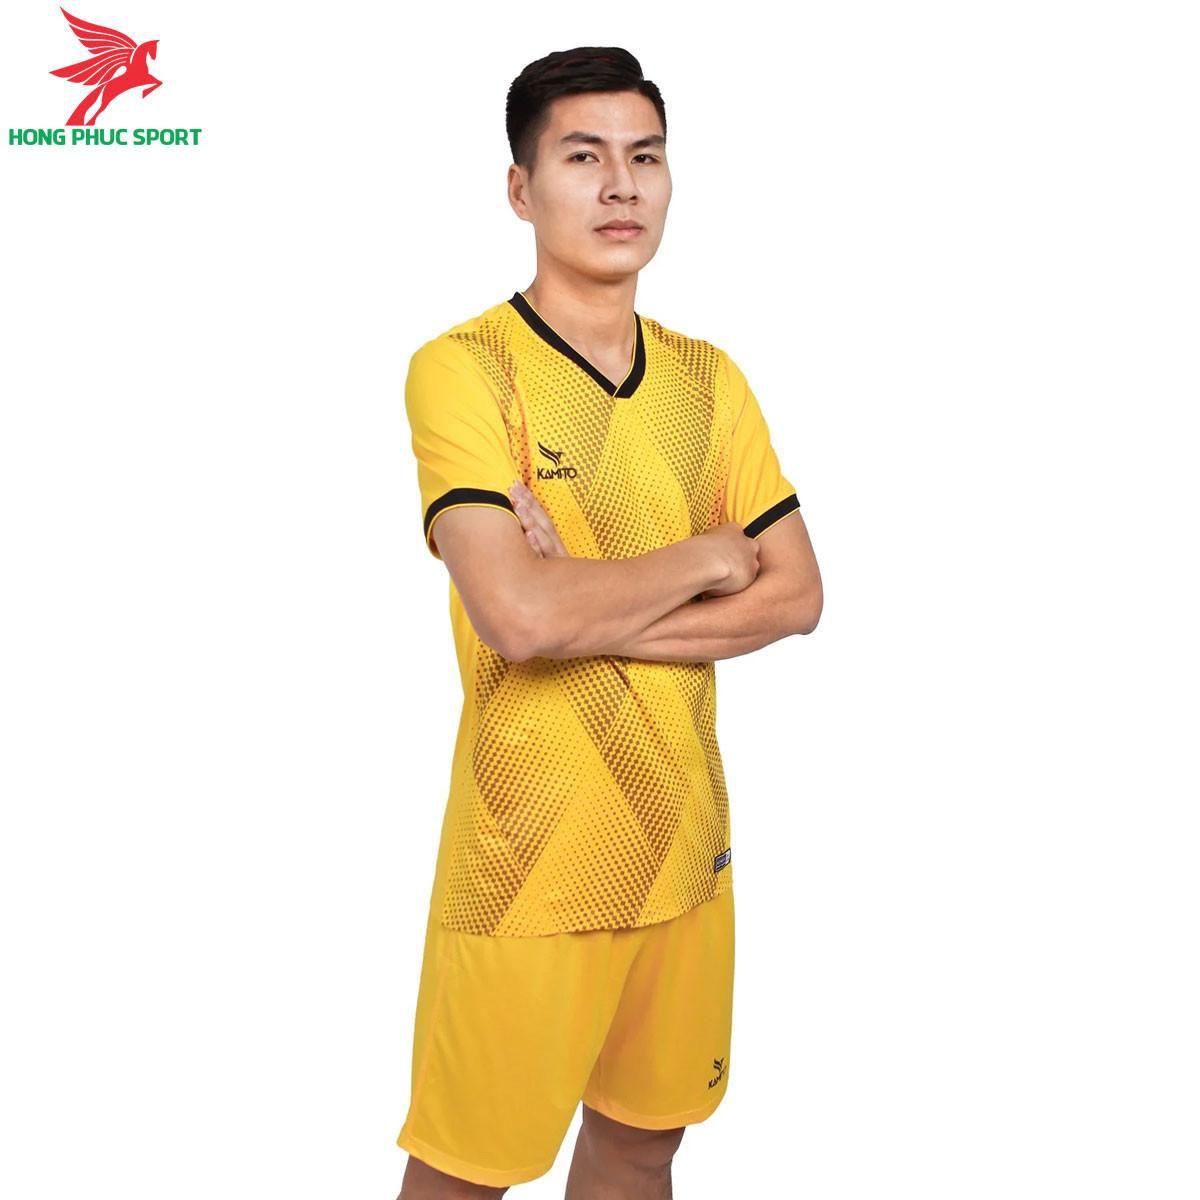 https://cdn.hongphucsport.com/unsafe/s4.shopbay.vn/files/285/ao-khong-logo-kamito-msh2101-mau-vang-3-6052da34aa83a.jpg